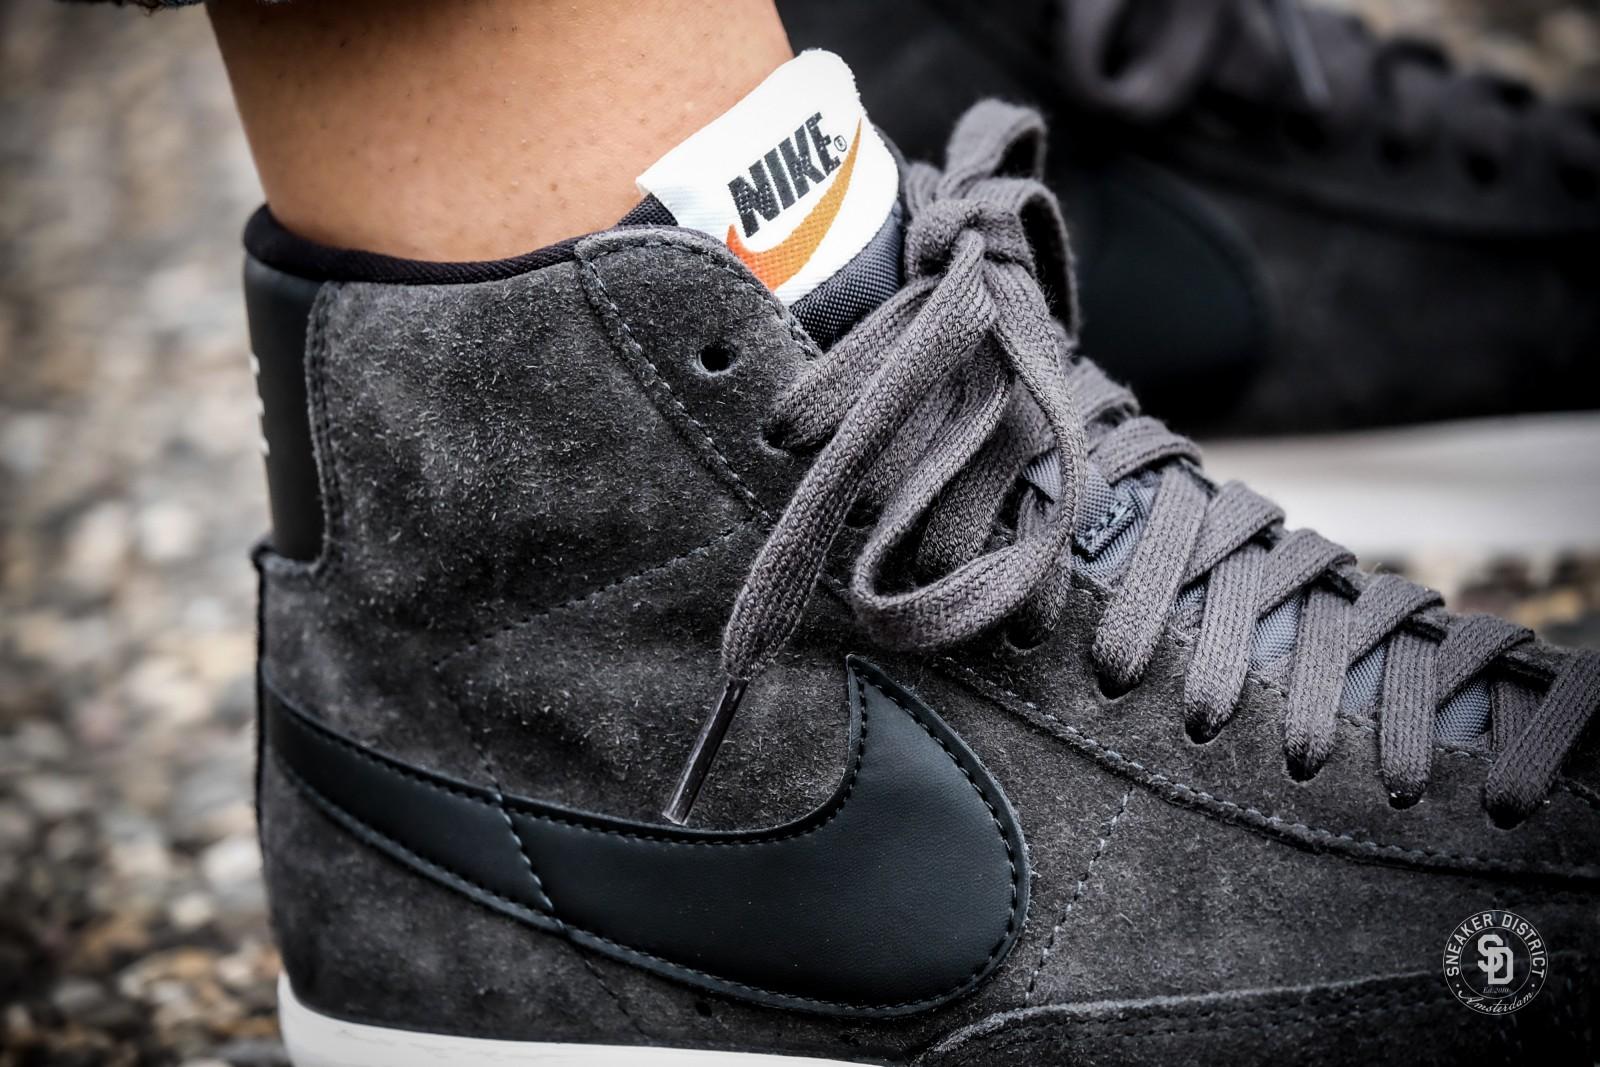 Nike Women's Blazer Mid Suede Vintage